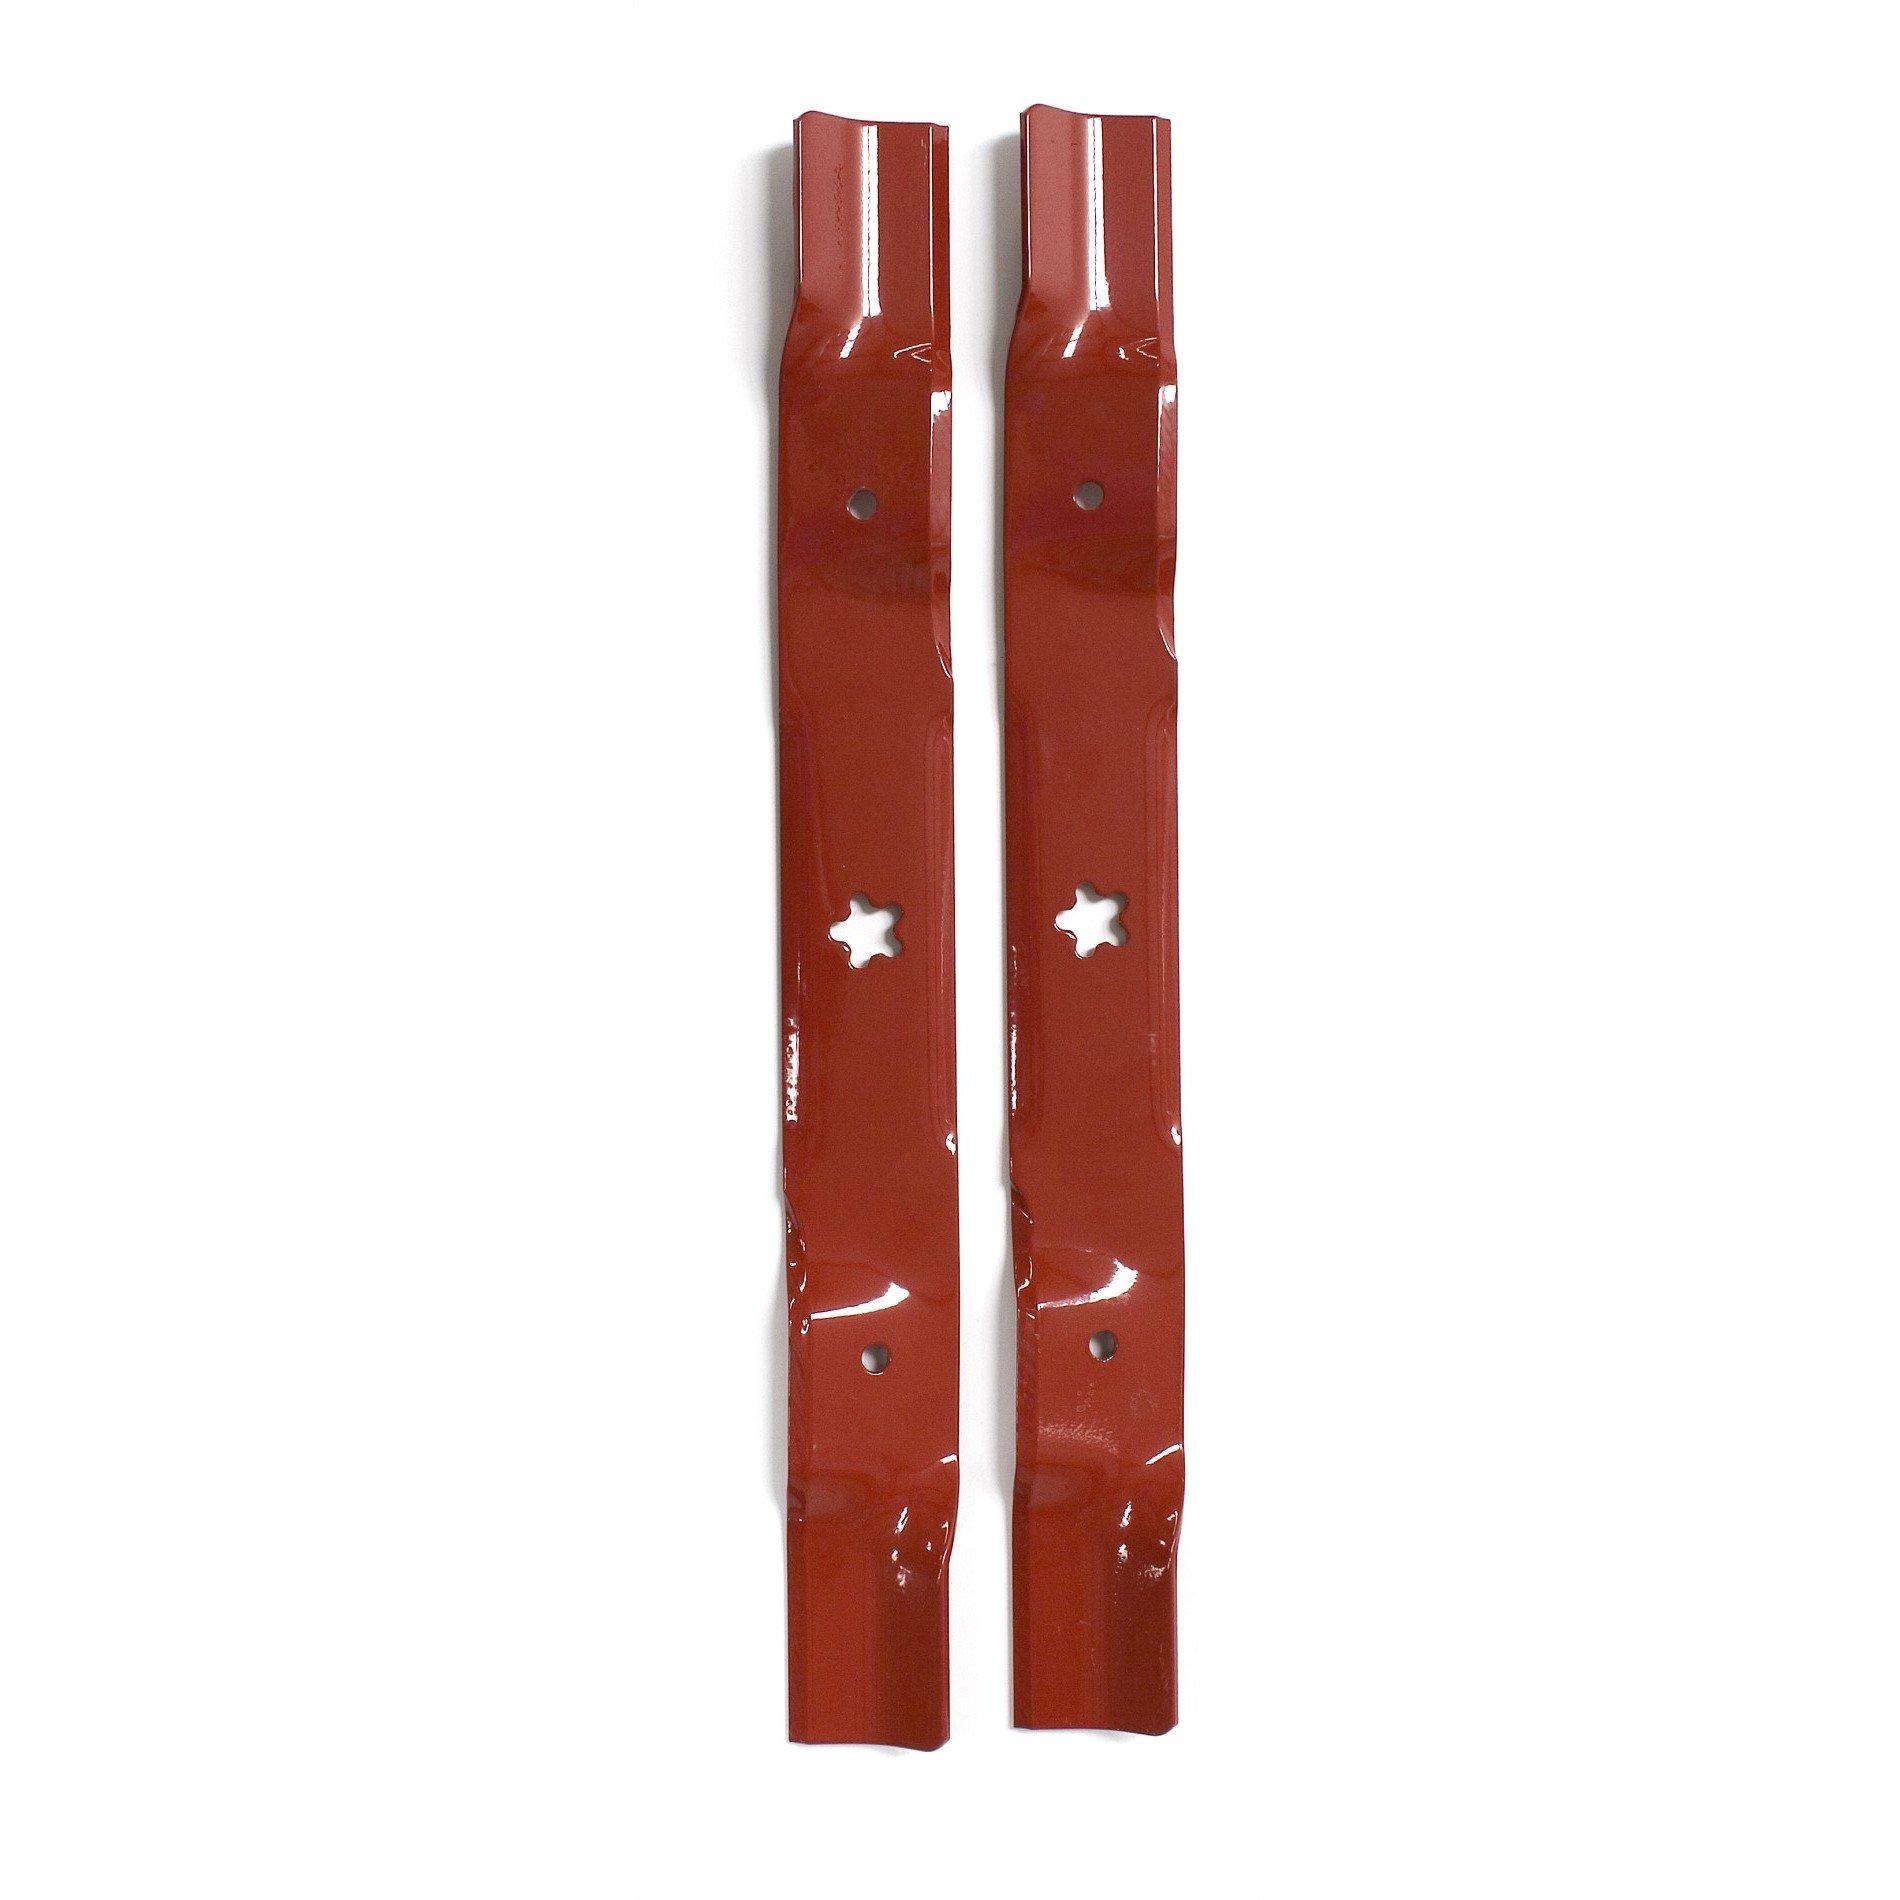 Husqvarna 954636867 42-Inch Lawn Mower Mulching 2 Blade Kit For LT18542, LTH18542, LTH2042 and YTH1542XP